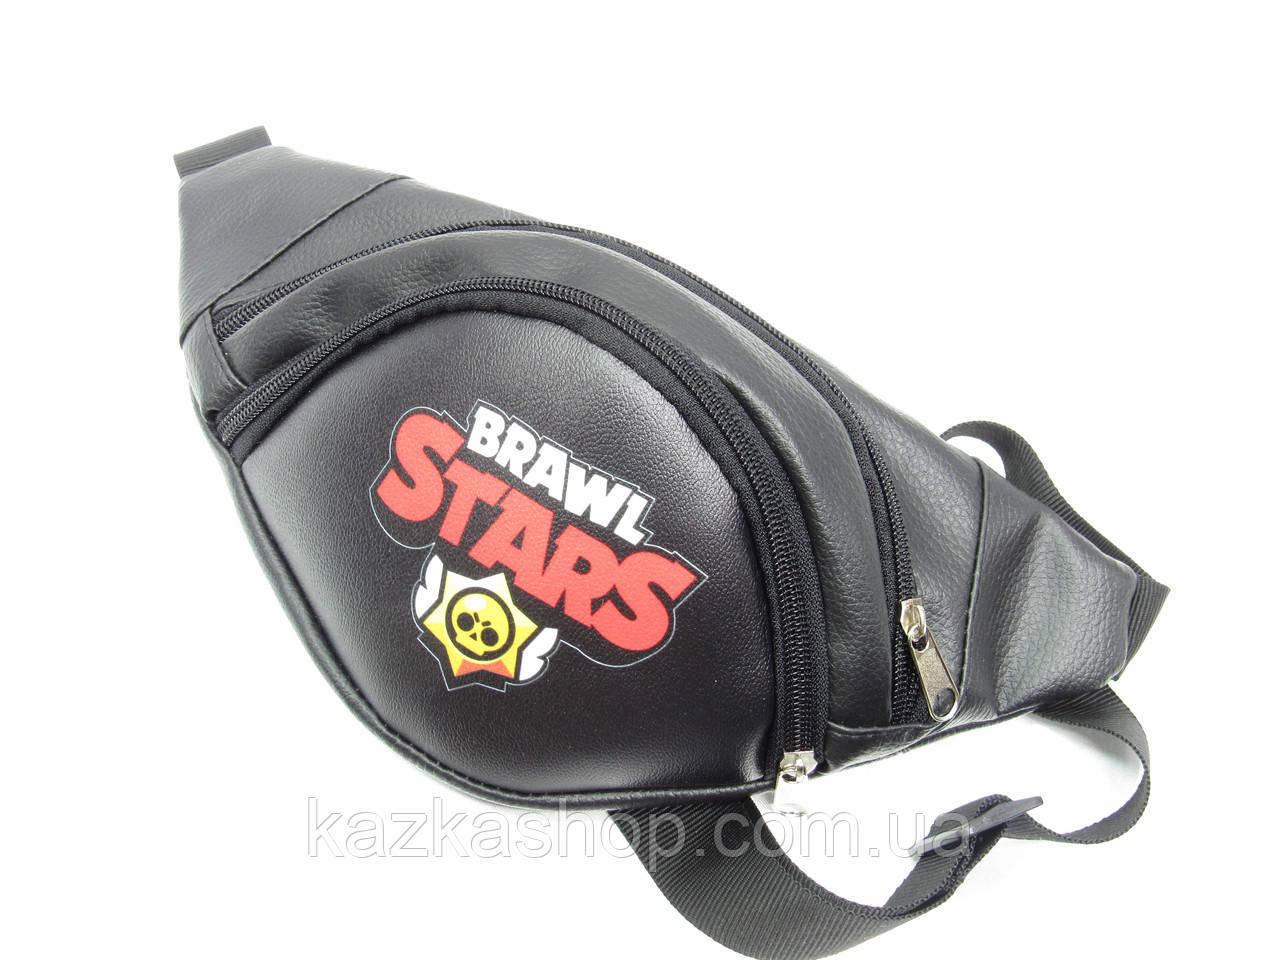 Стильная бананка Brawl Stars, Бравл Старс, барыжка, сумка на пояс, с накатом, искусственная кожа